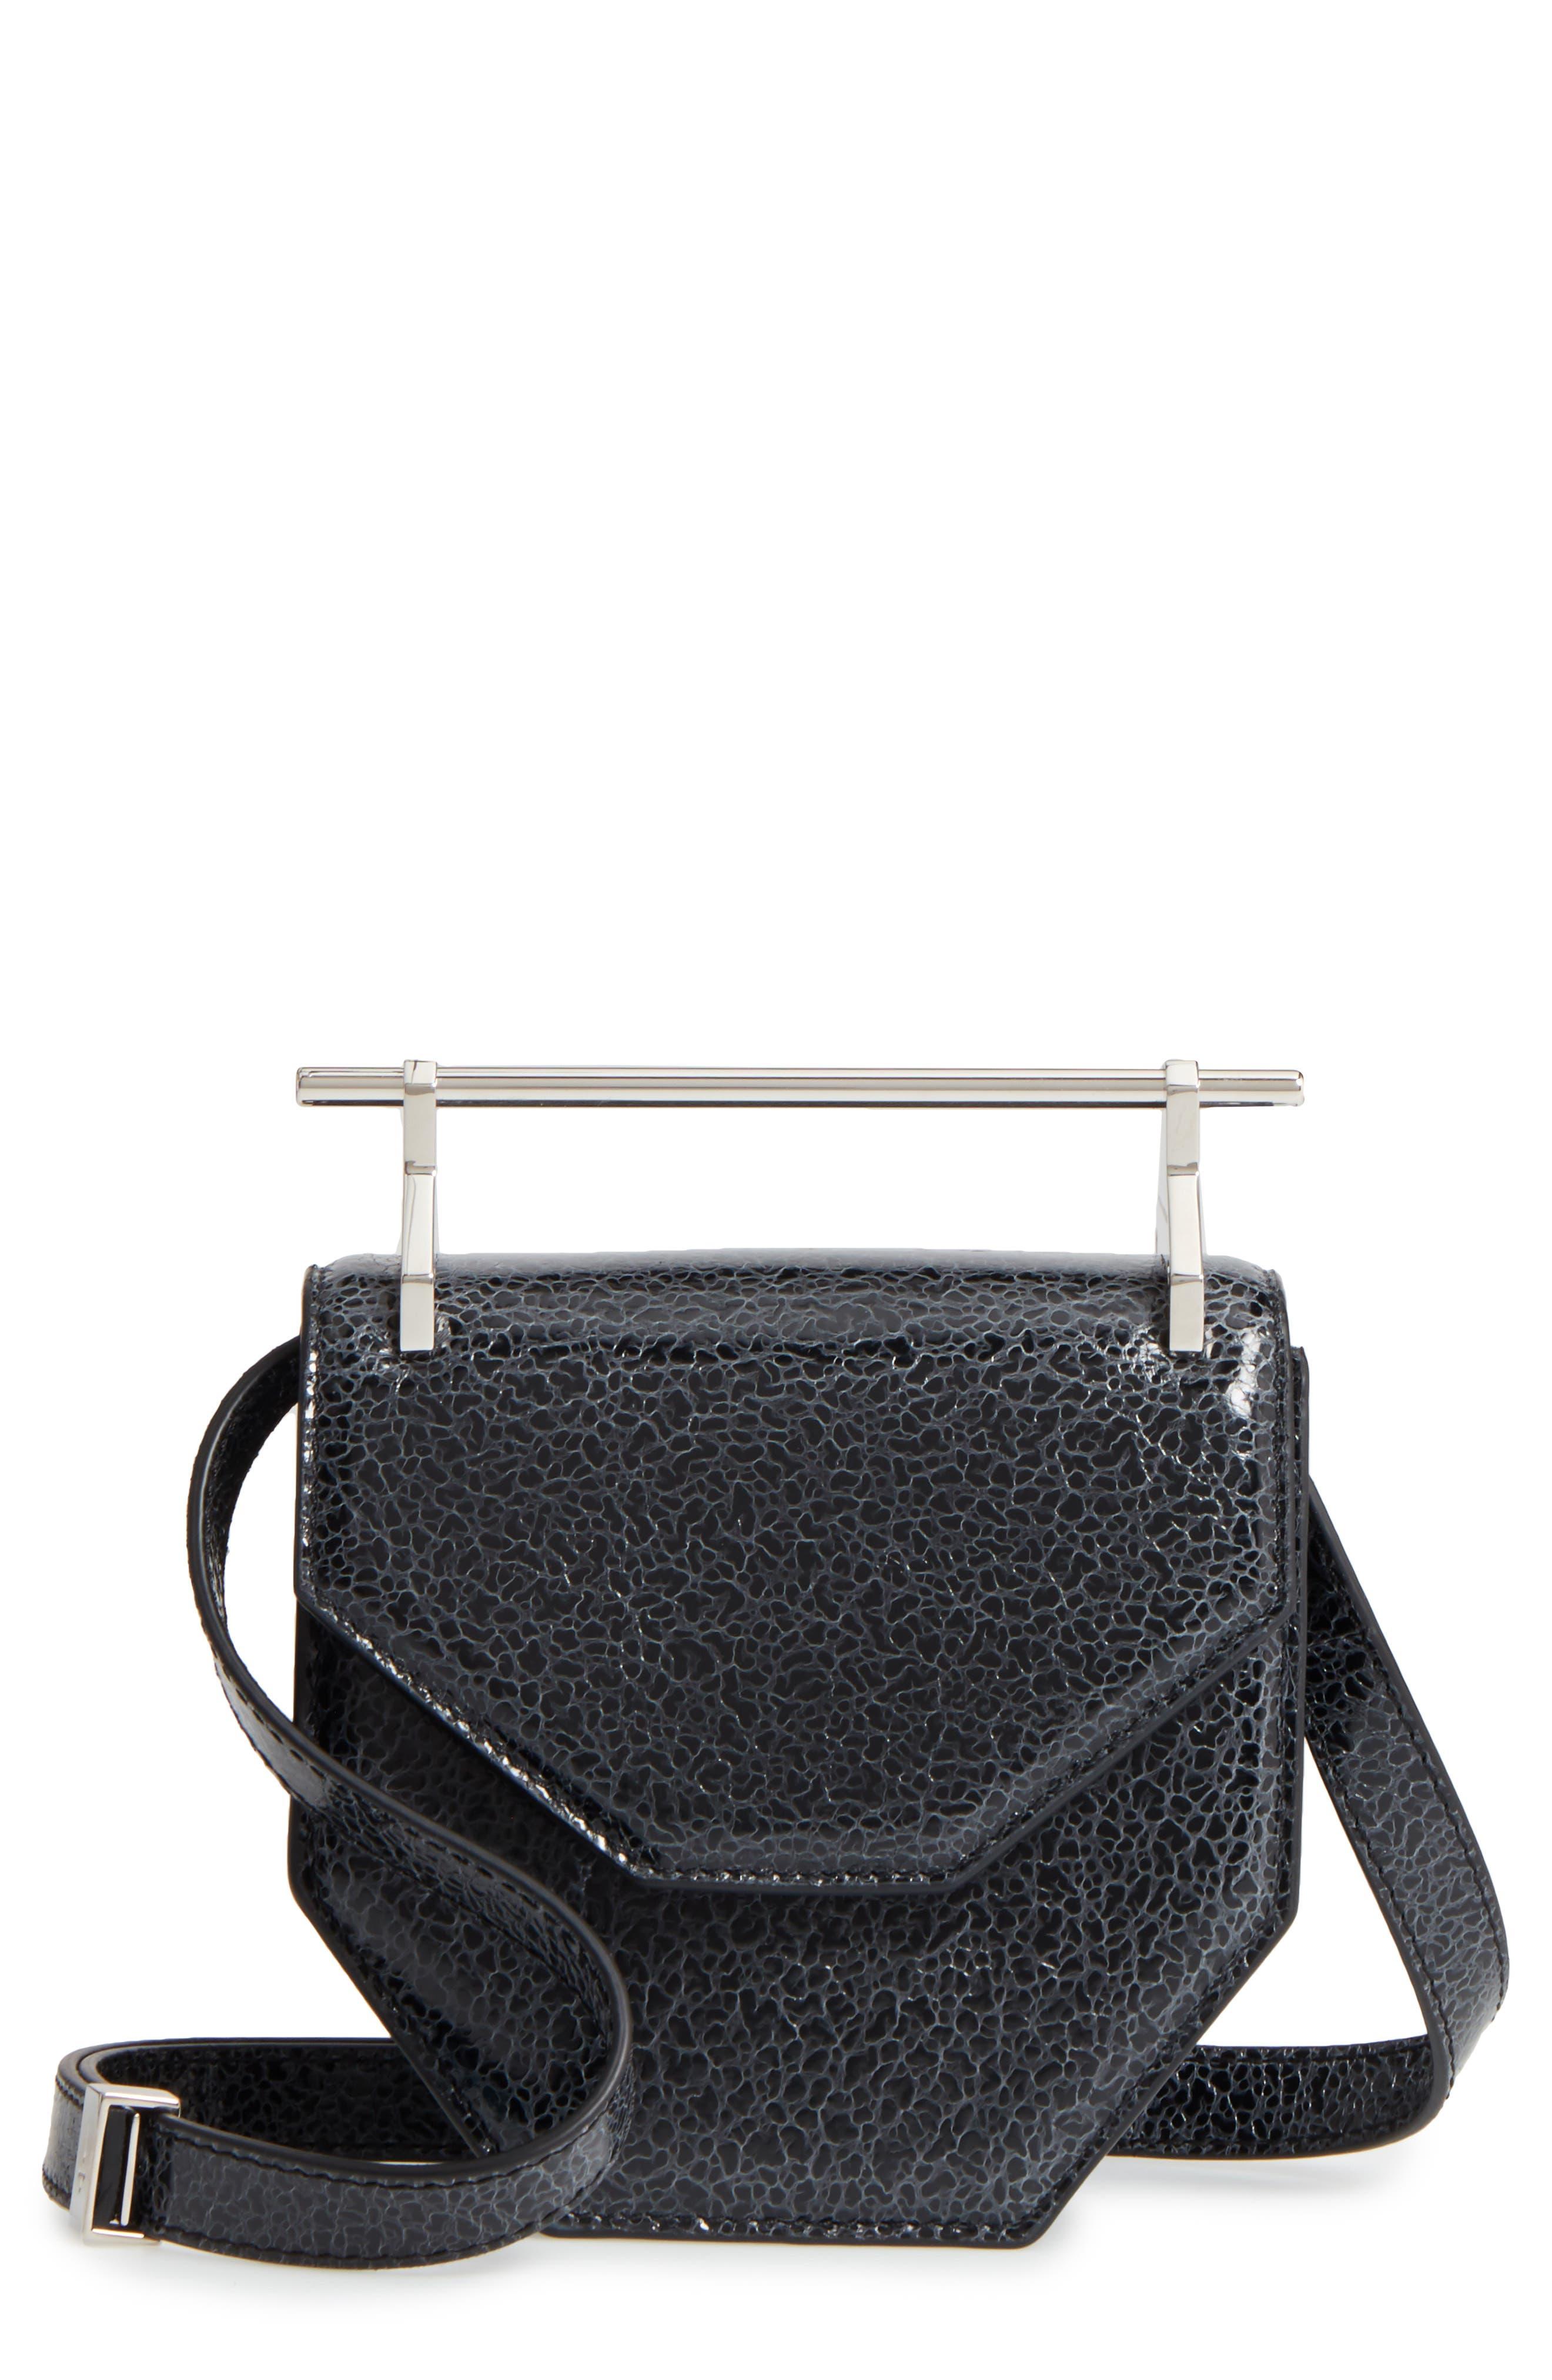 High Quality M2Malletier Mini Amor Fati Single Calfskin Leather Shoulder Bag